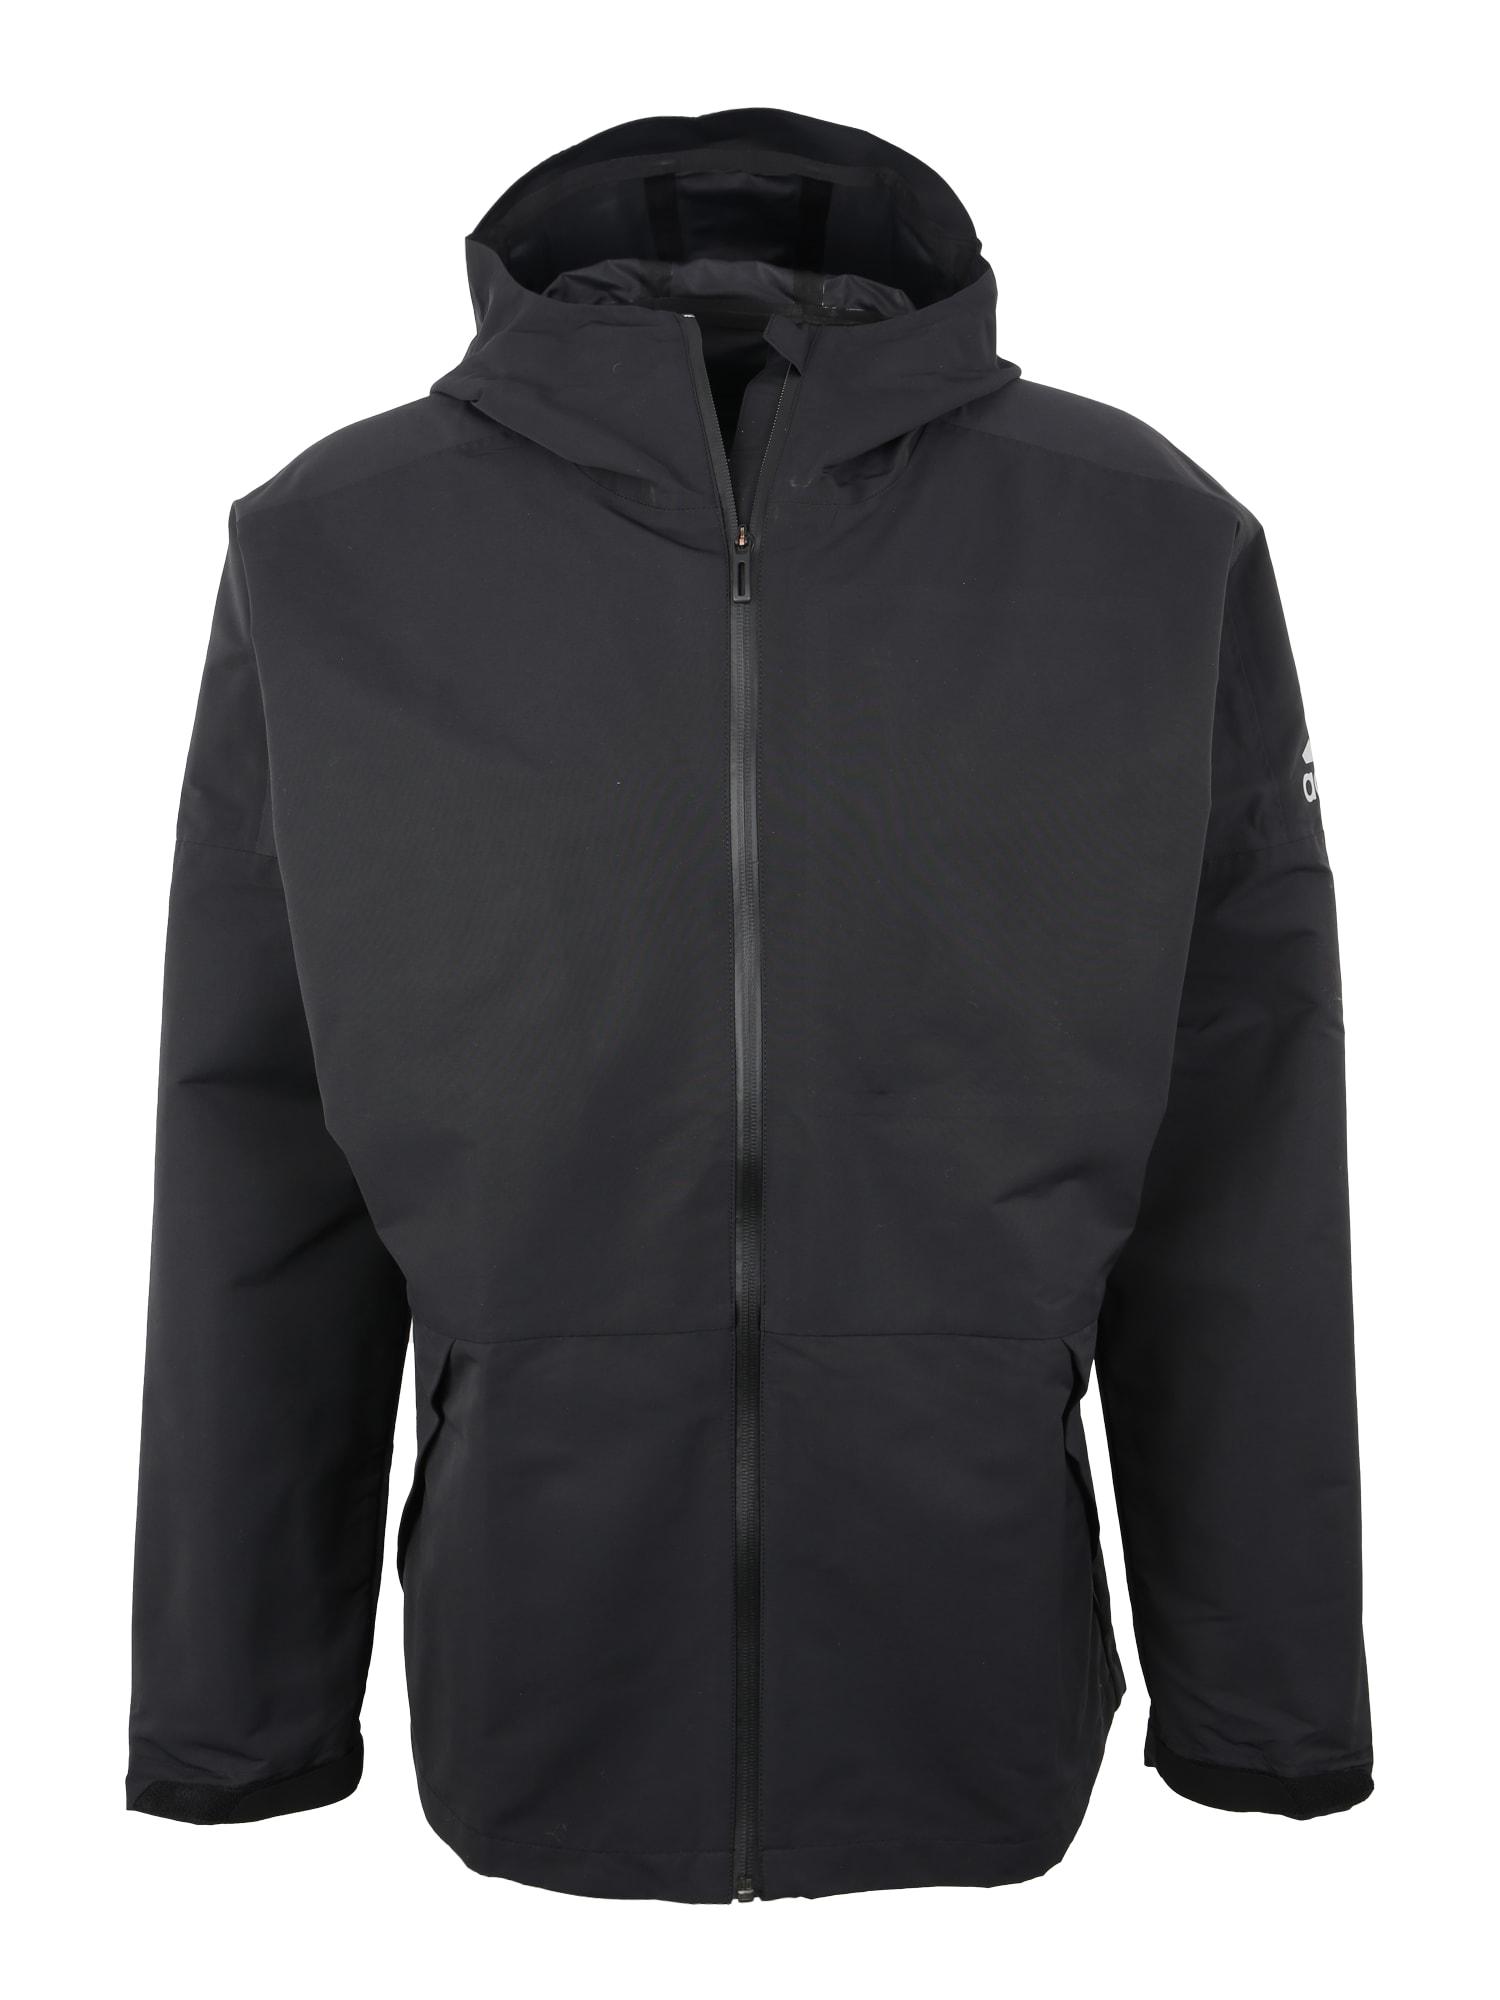 Outdoorová bunda černá ADIDAS PERFORMANCE